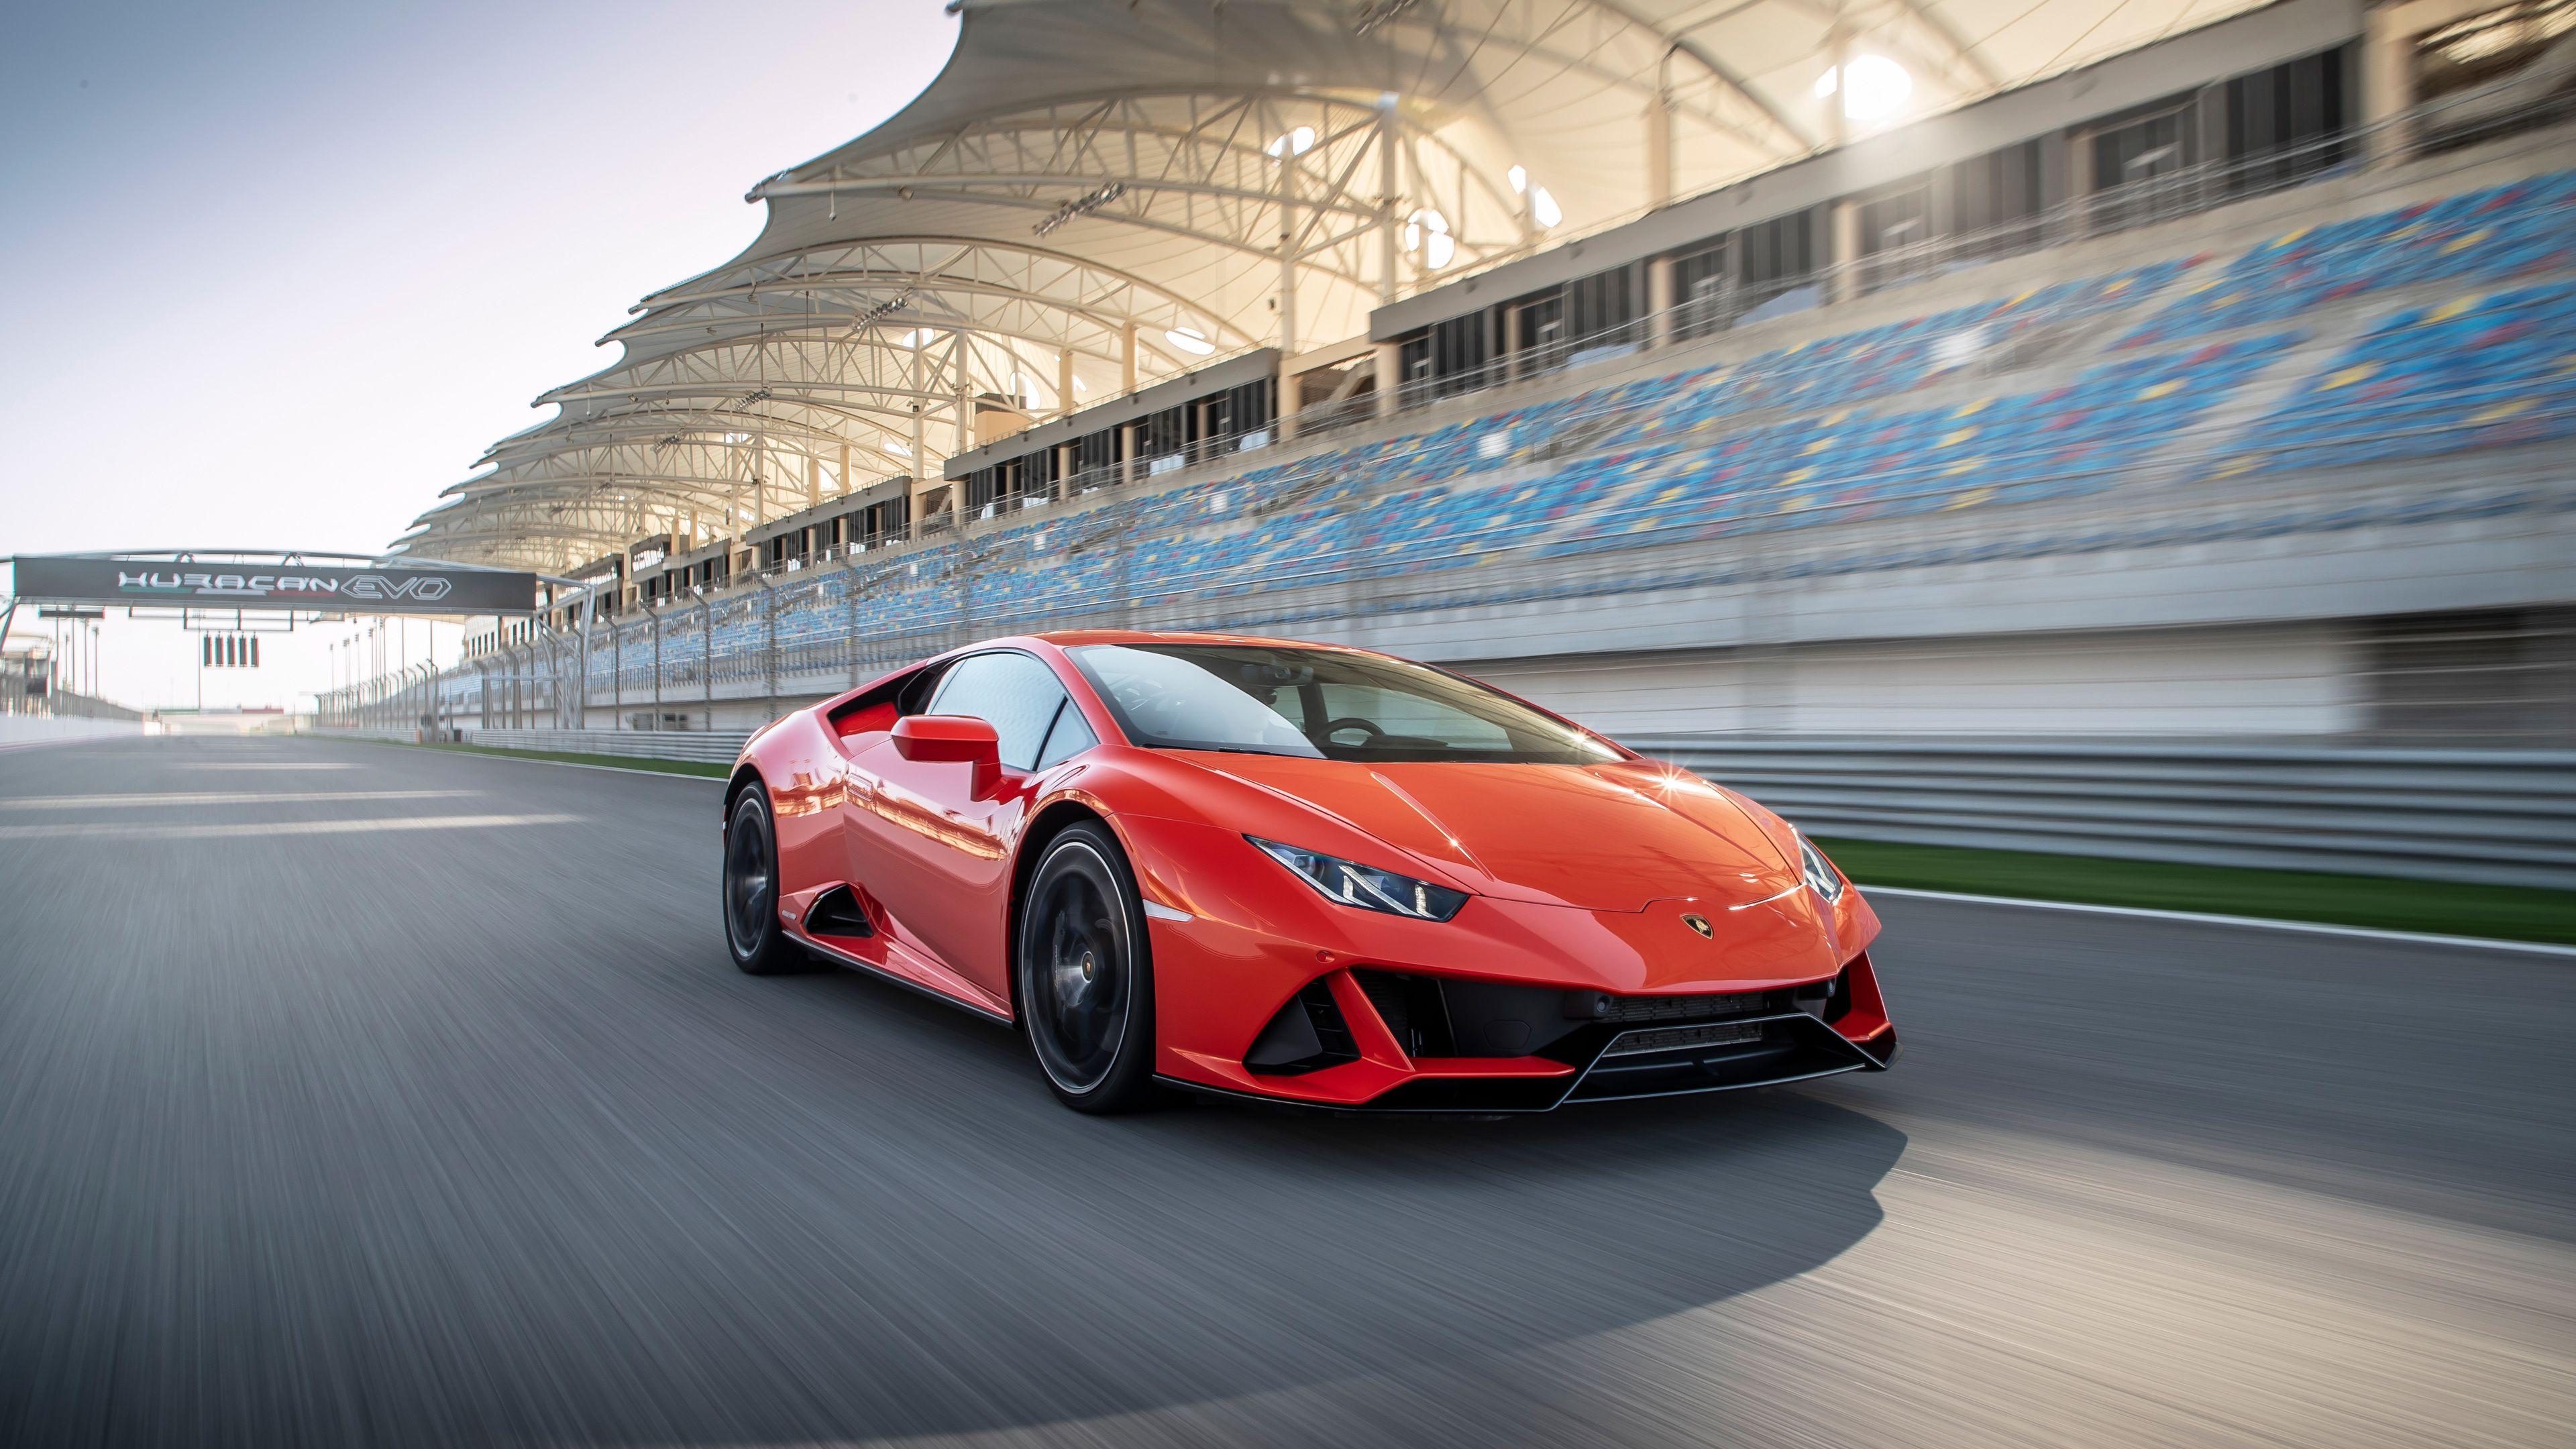 2019 Lamborghini Huracan EVO 4k lamborghini wallpapers, lamborghini huracan wall…